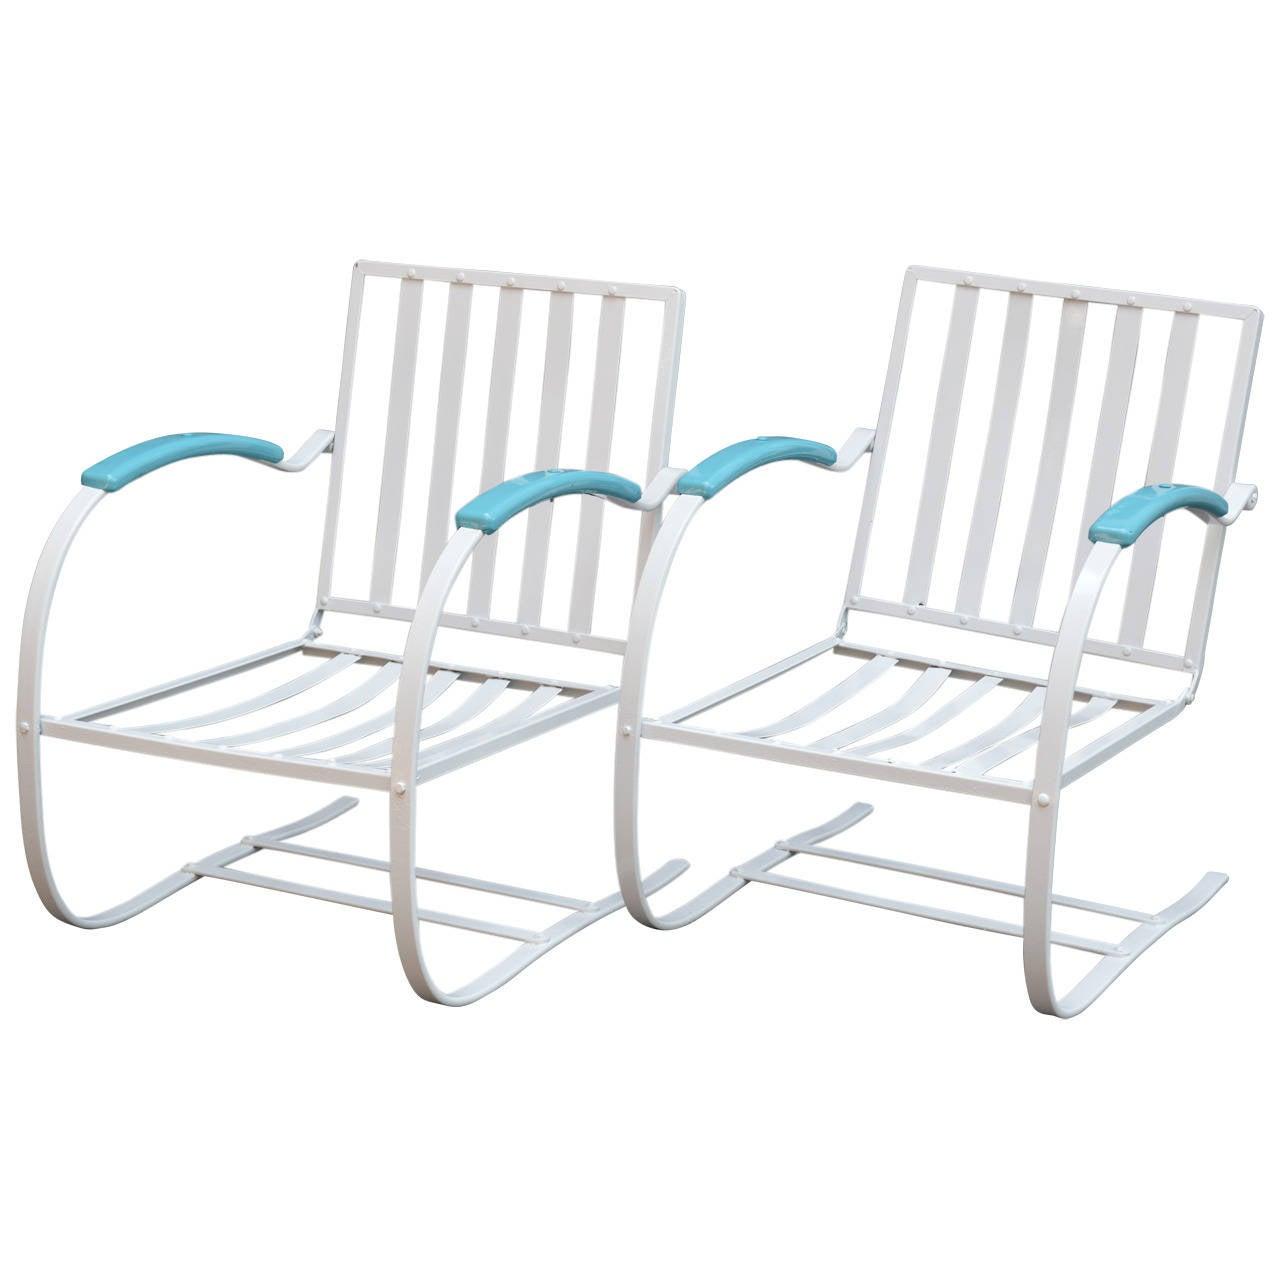 Set Of Three Metal Patio Chairs At 1stdibs